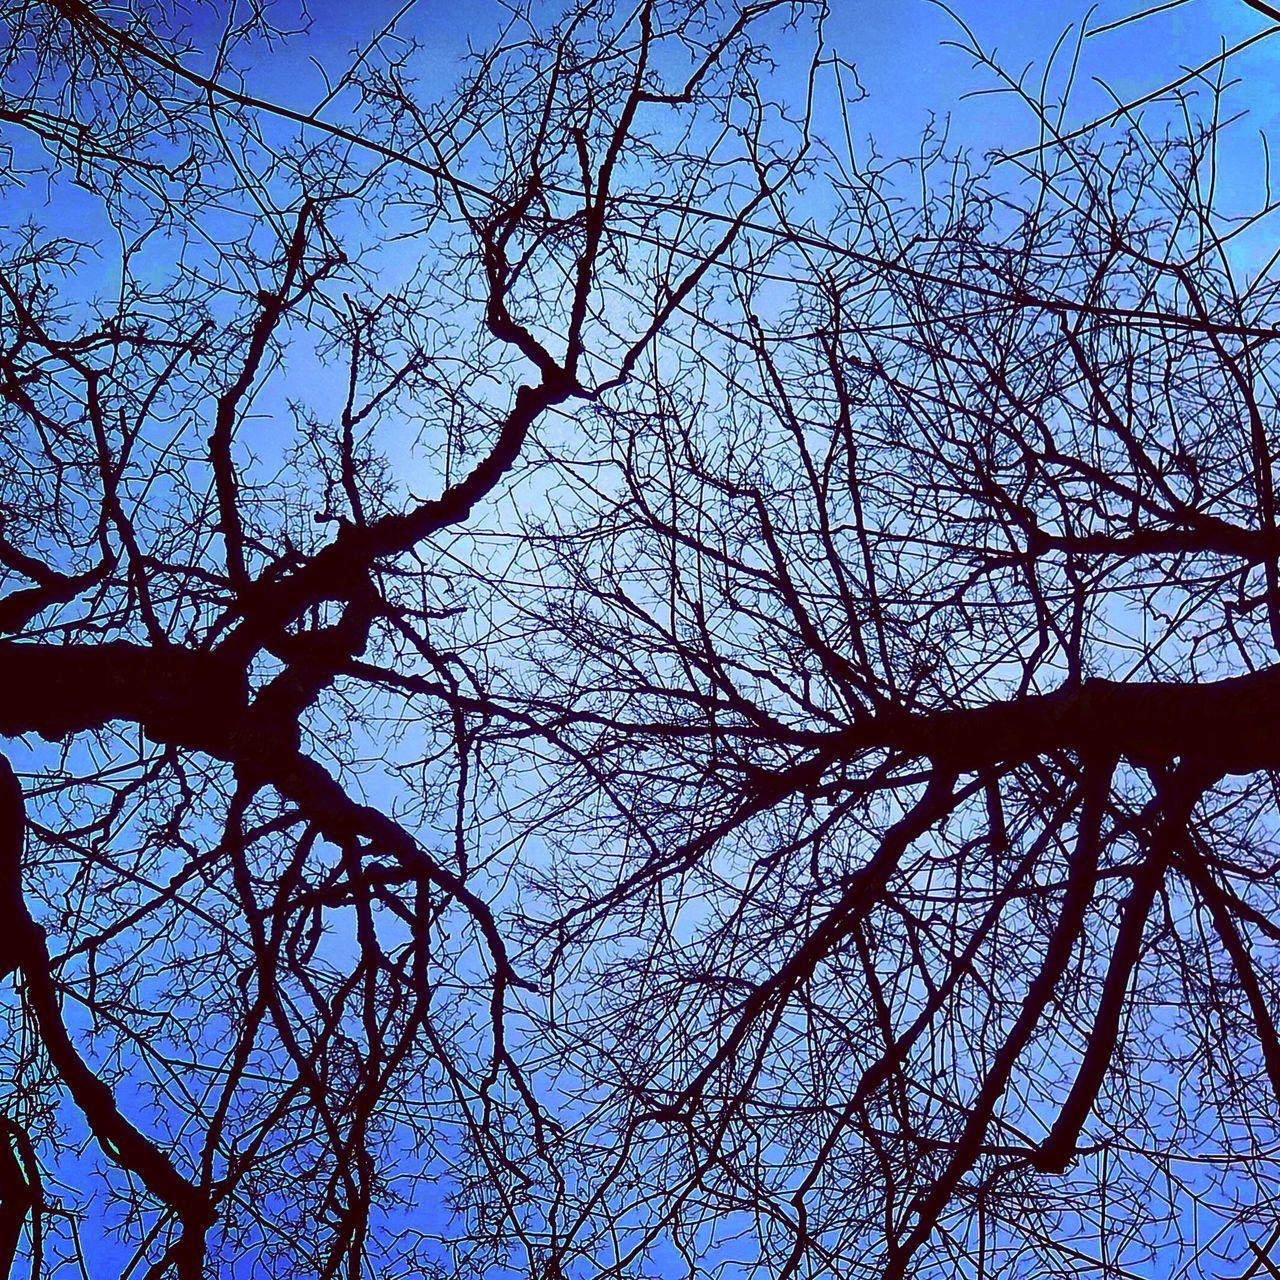 Iran Iran♥ Persian Trees Tree TreePorn Upper Branches Sky Skyporn Sky_collection Gokyuzu First Eyeem Photo EyeEm Best Shots OpenEdit Open Edit Eye4photography  EyeEm Best Edits EyeEm Gallery EyeEm EyeEmBestPics Eyem Best Shots Taking Photos Taking Pictures Taking Photo Take Photos